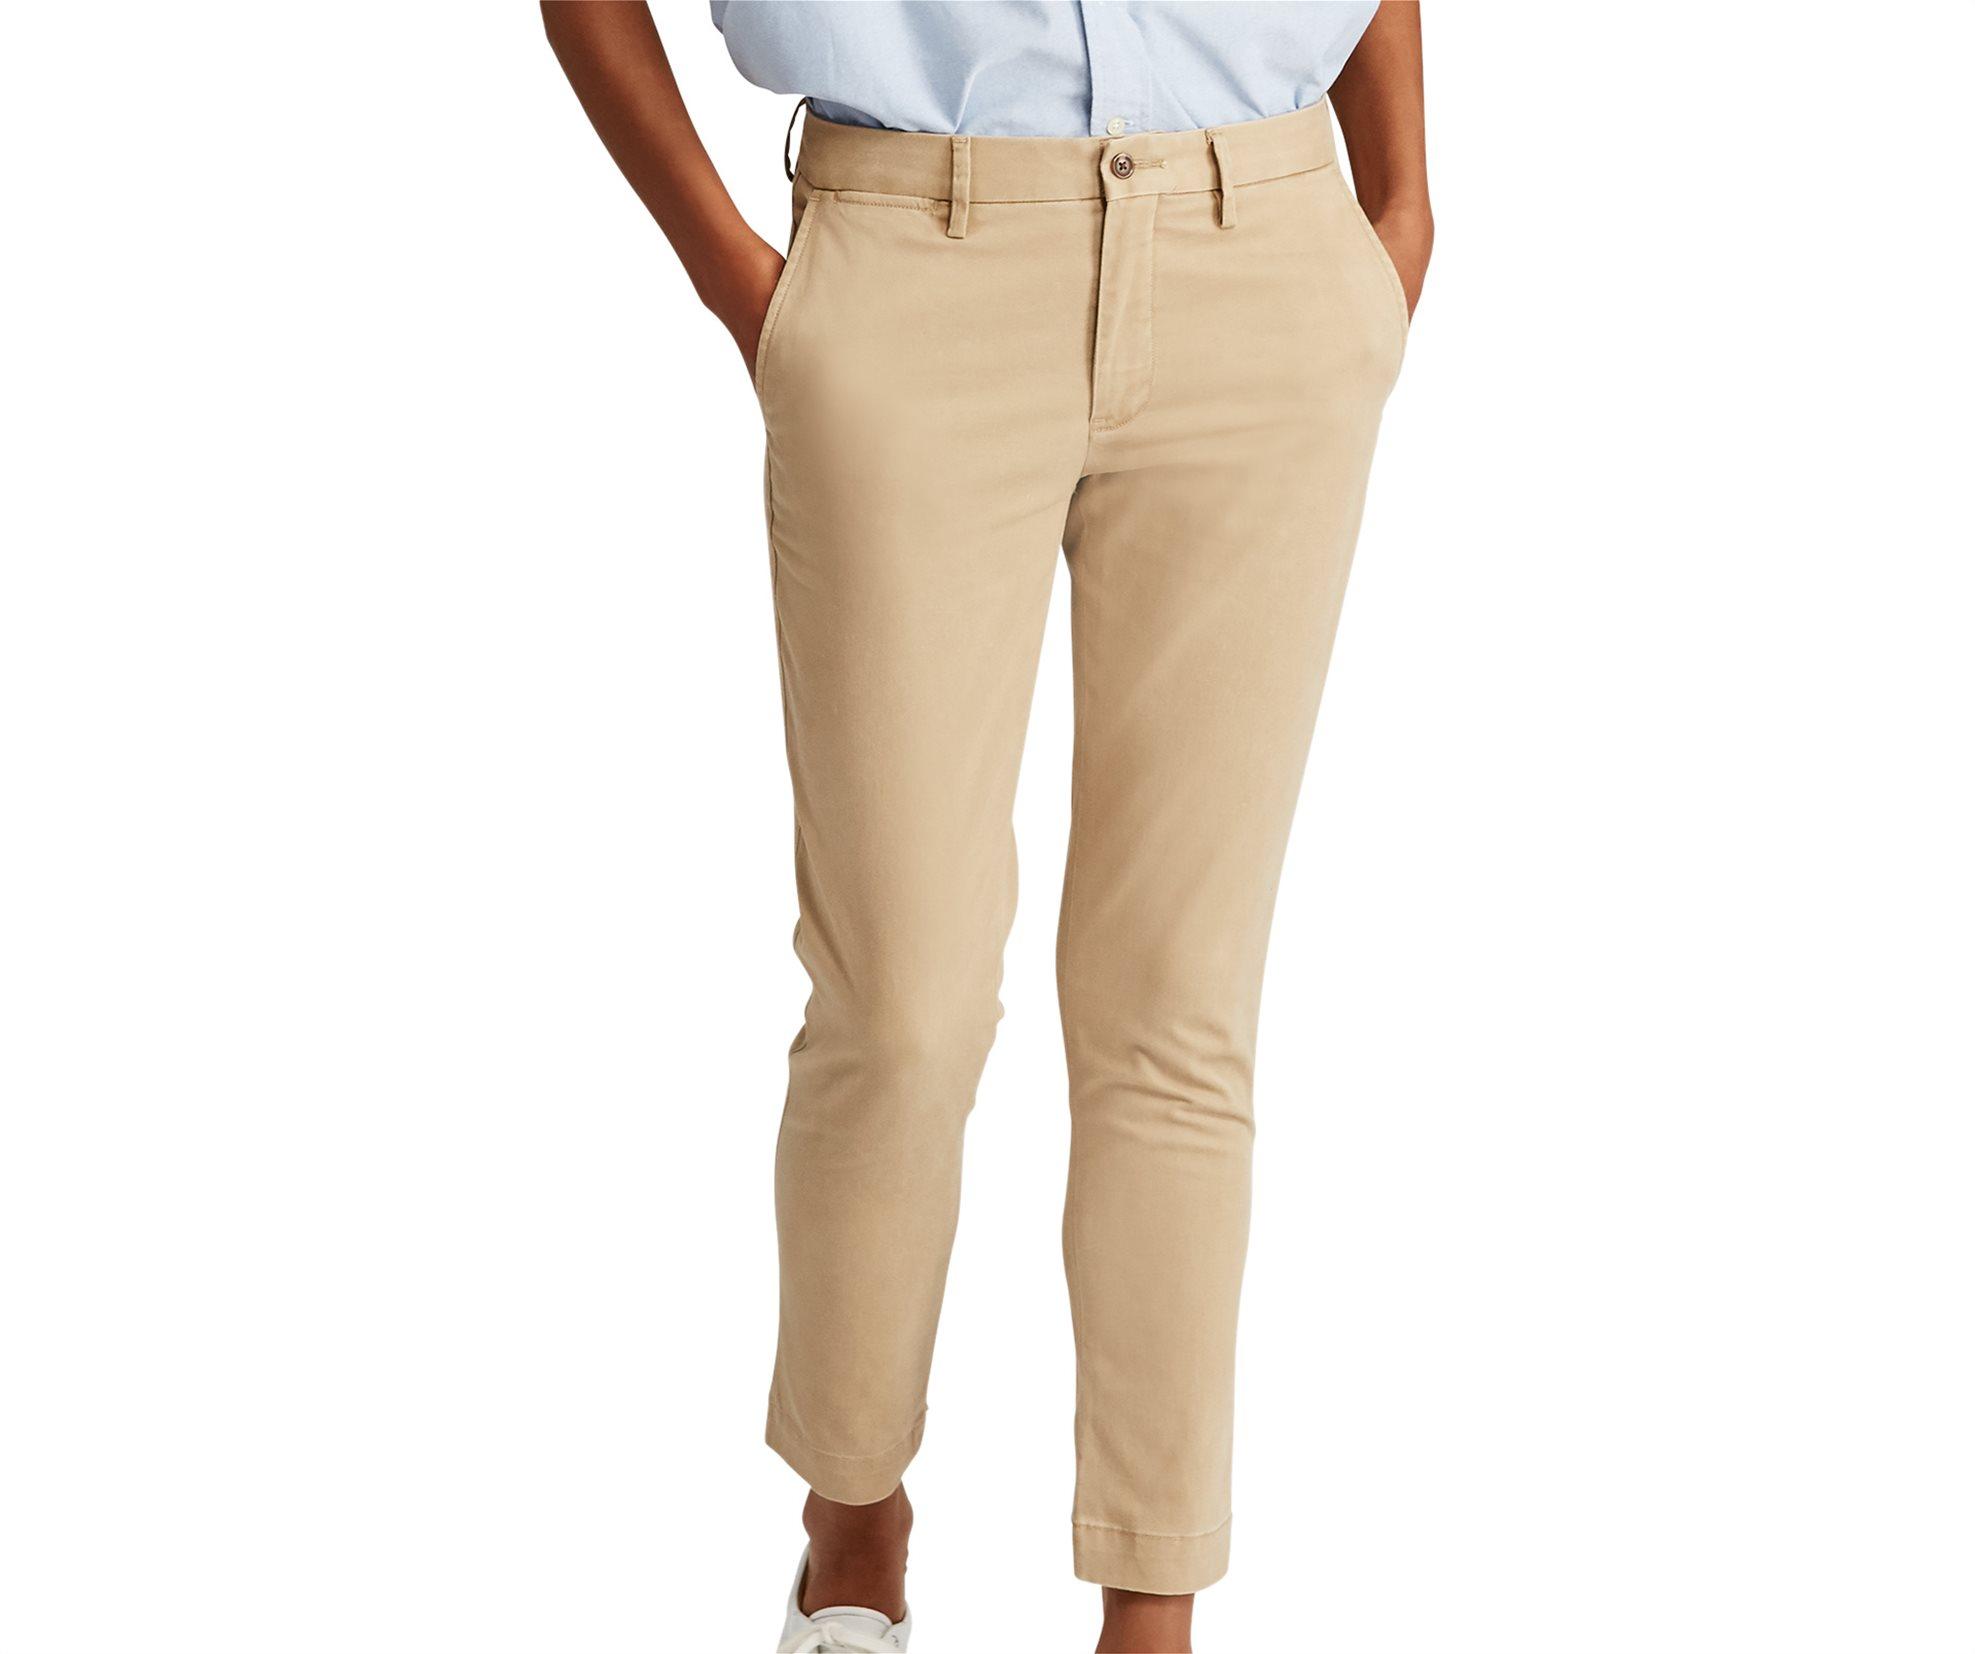 Polo Ralph Lauren γυναικείο παντελόνι Stretch Cotton Straight Pant Luxury tan -  γυναικα   ρουχα   παντελόνια   chinos